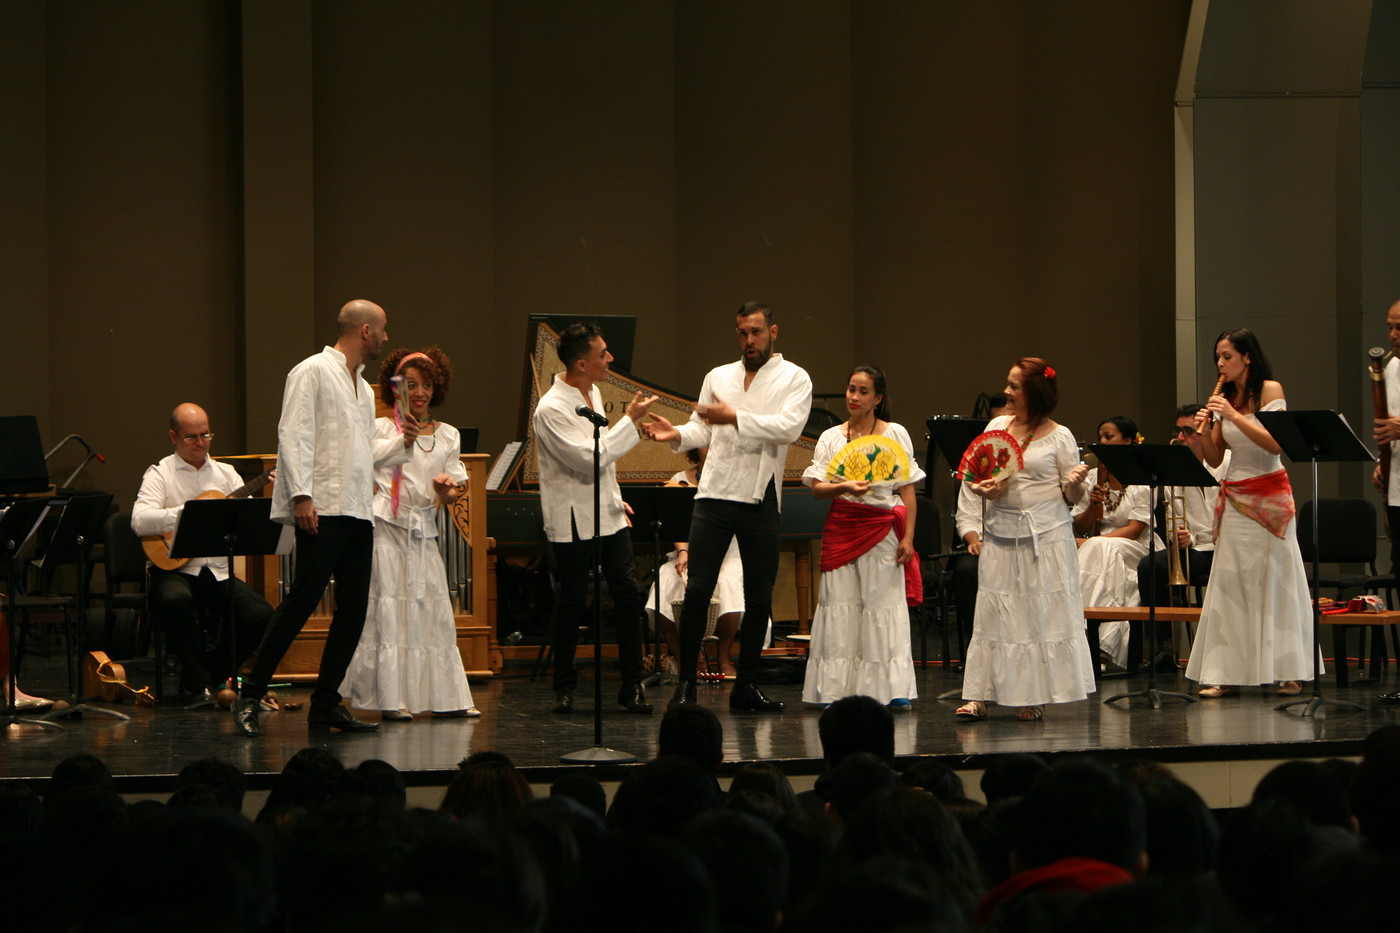 Cuban Ensemble Ars Long de La Habana performing at the UWM Zelazo Center. Photo courtesy of Early Music Now.